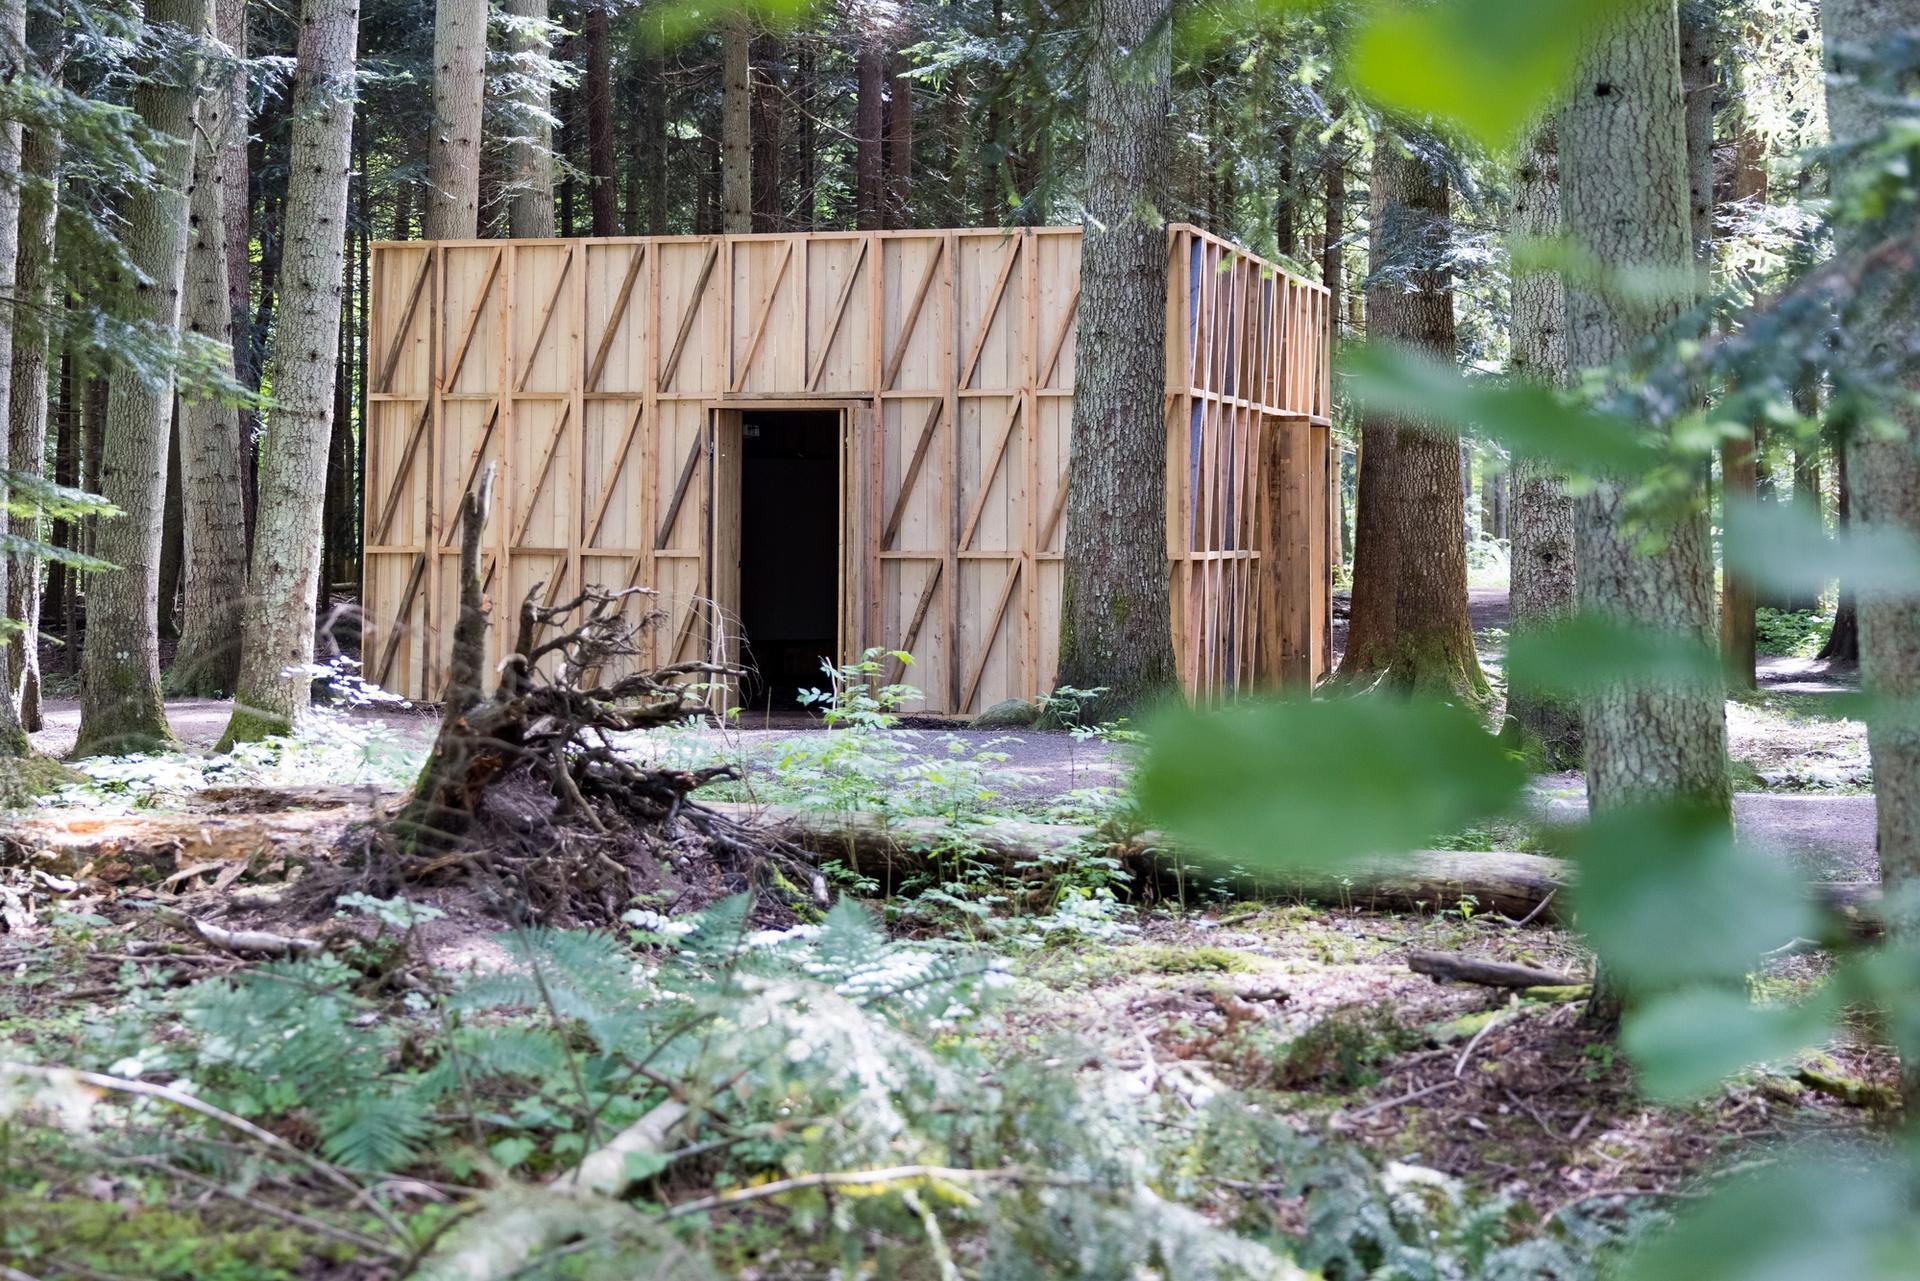 Momentum 11 takes place across various sites in Moss, Norway. Installation view of S-AR's Pabellón Plataforma (Platform Pavilion), 2021 Photo: © Eivind Lauritzen